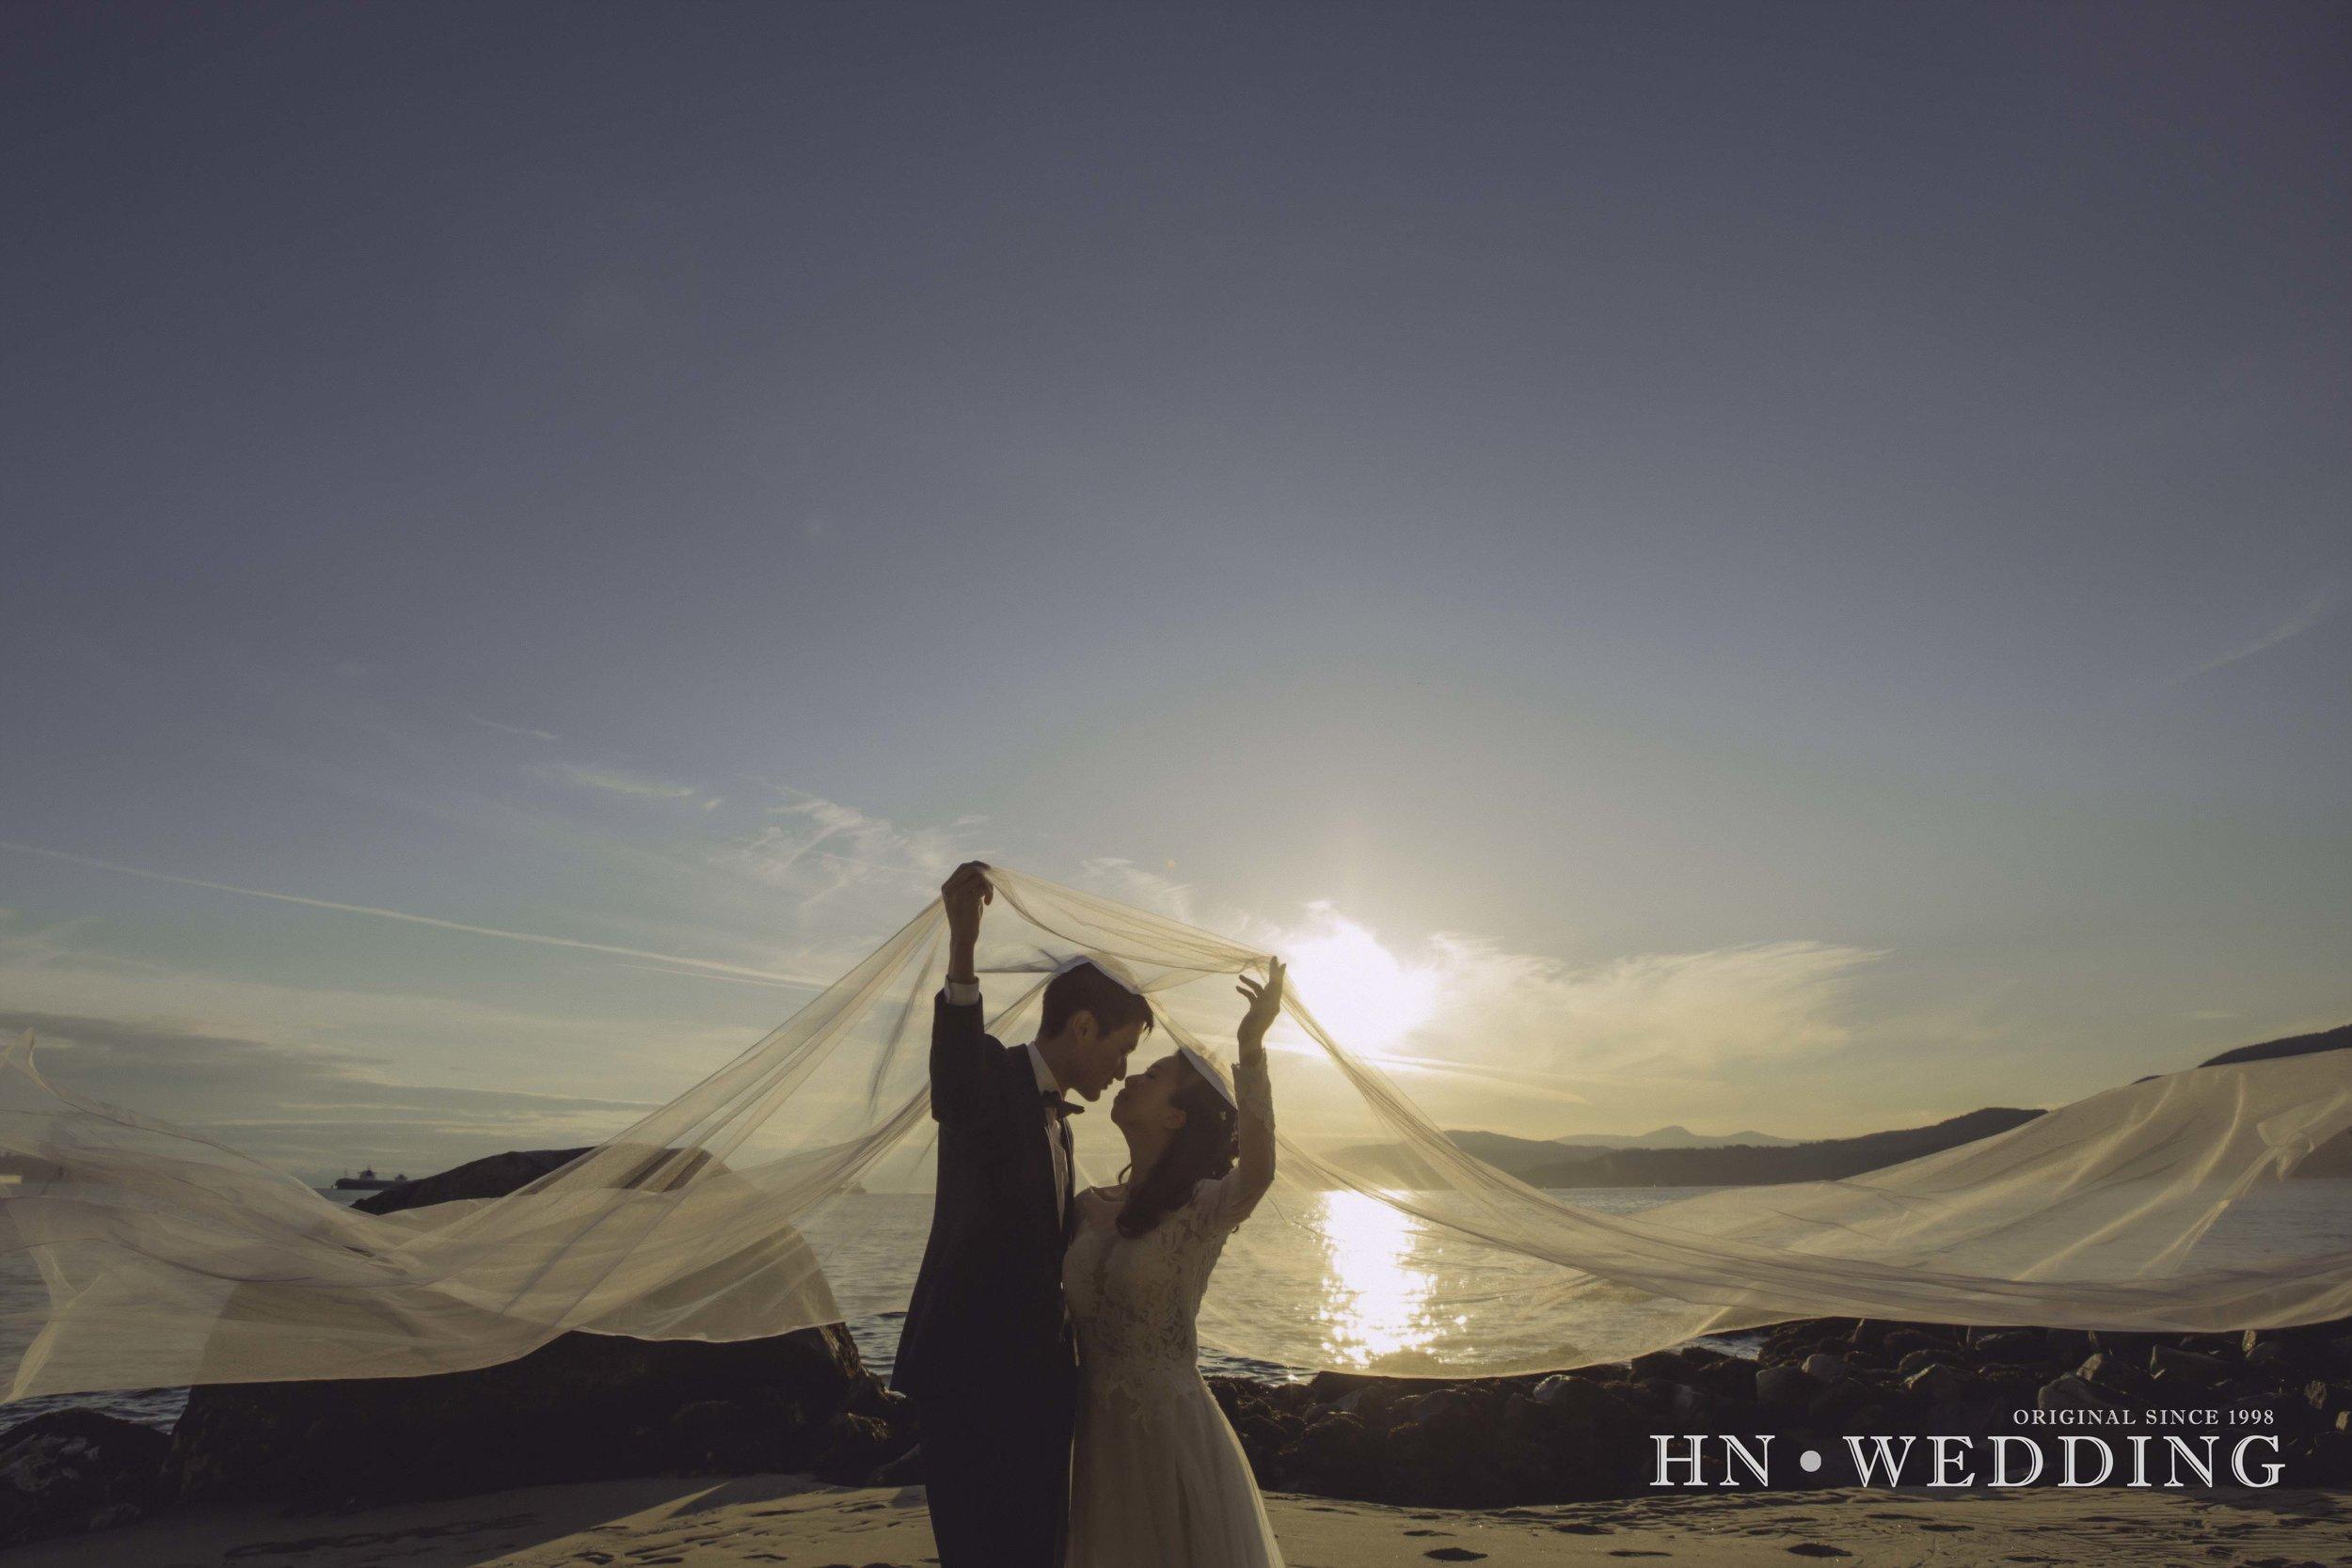 HNwedding-20170602-prewedding-0112.jpg